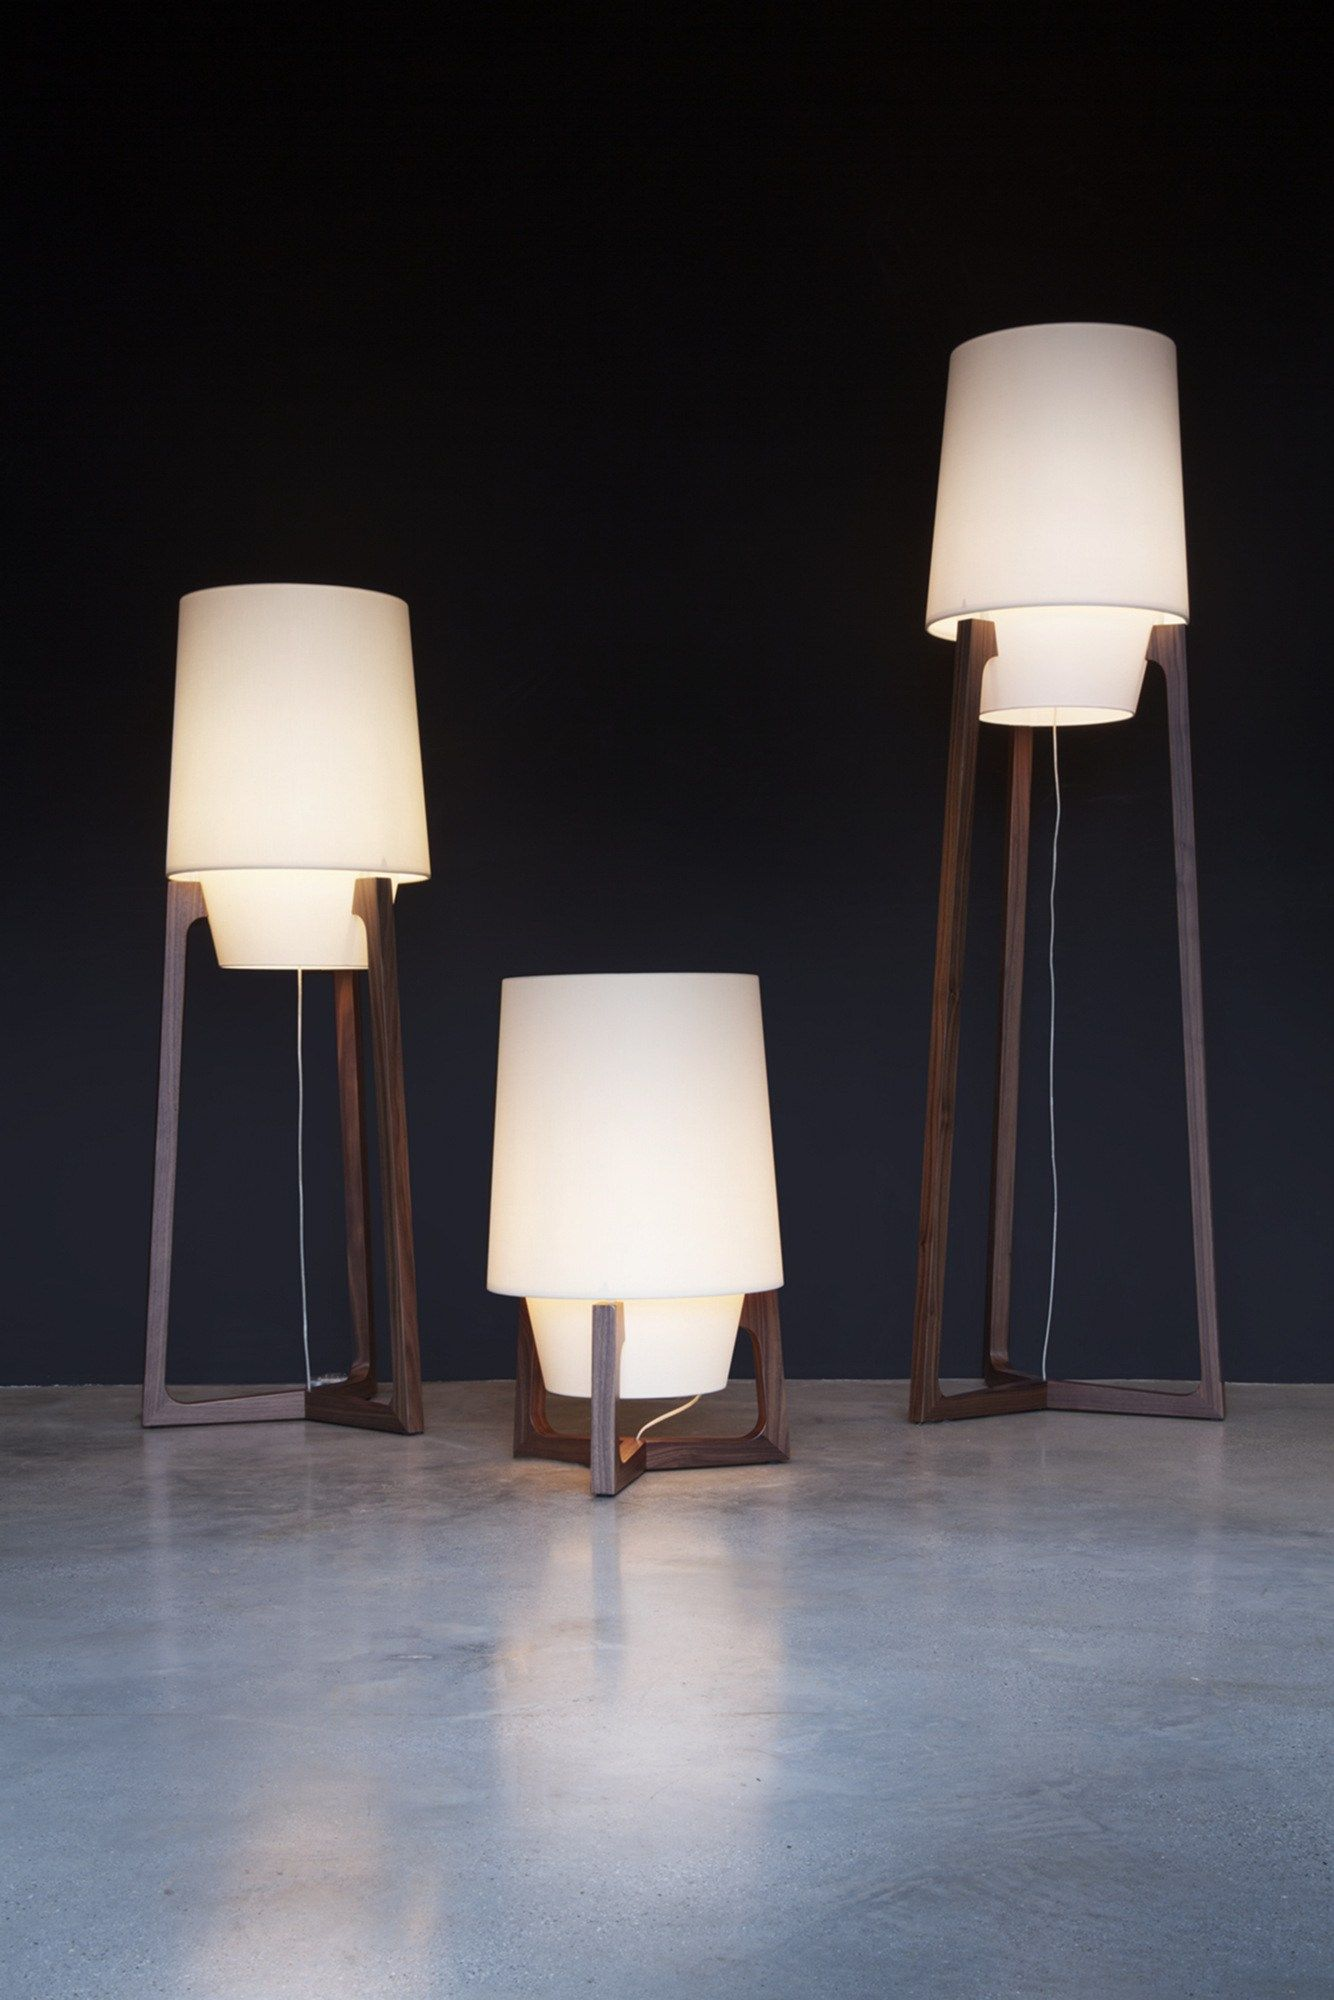 Wooden Floor Lamp Lampada 531 By Tonon Design Harald